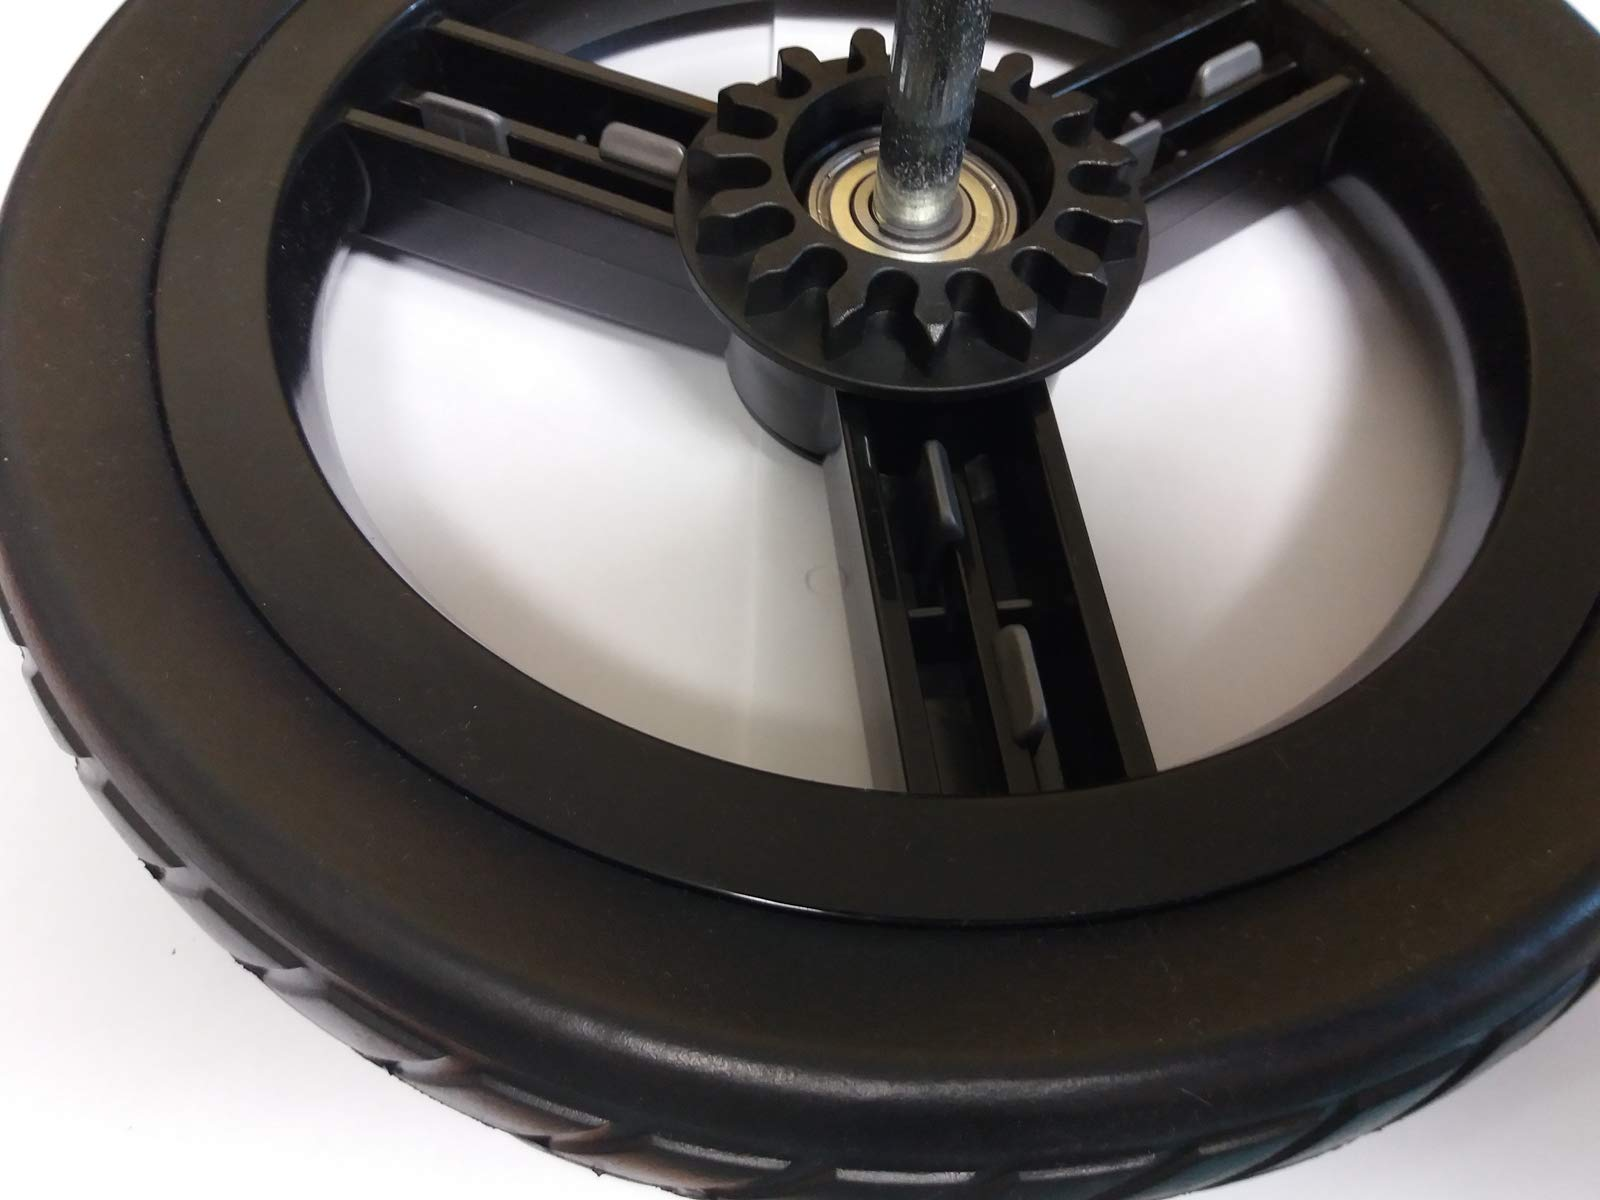 Peg Perego Ypsi Rear Wheel Replacement Peg Perego  3